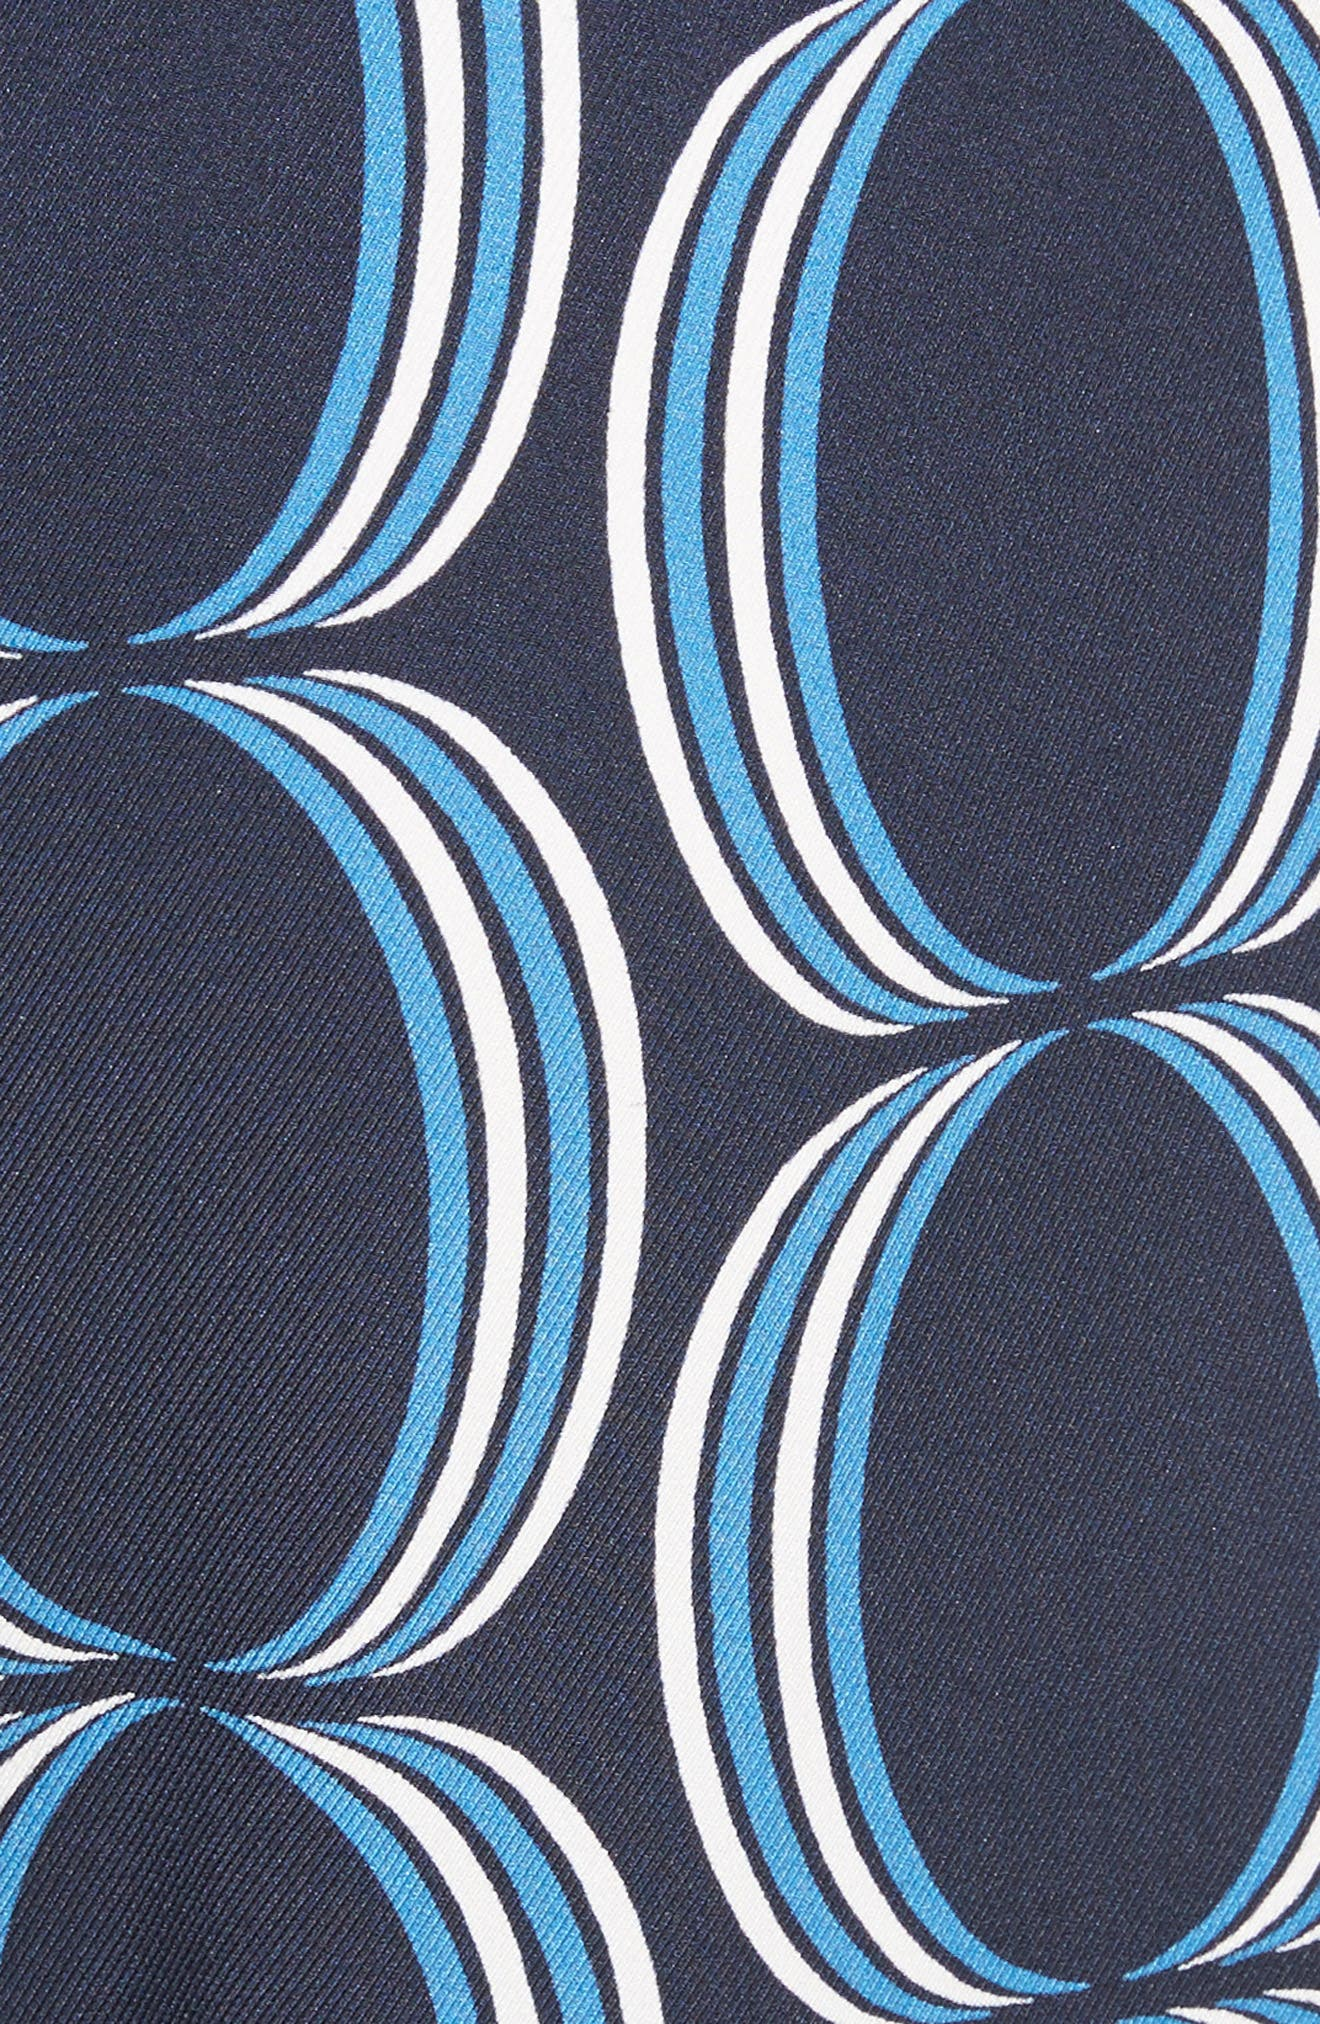 Oval Print Stretch Silk Twill Pants,                             Alternate thumbnail 5, color,                             Navy Multi